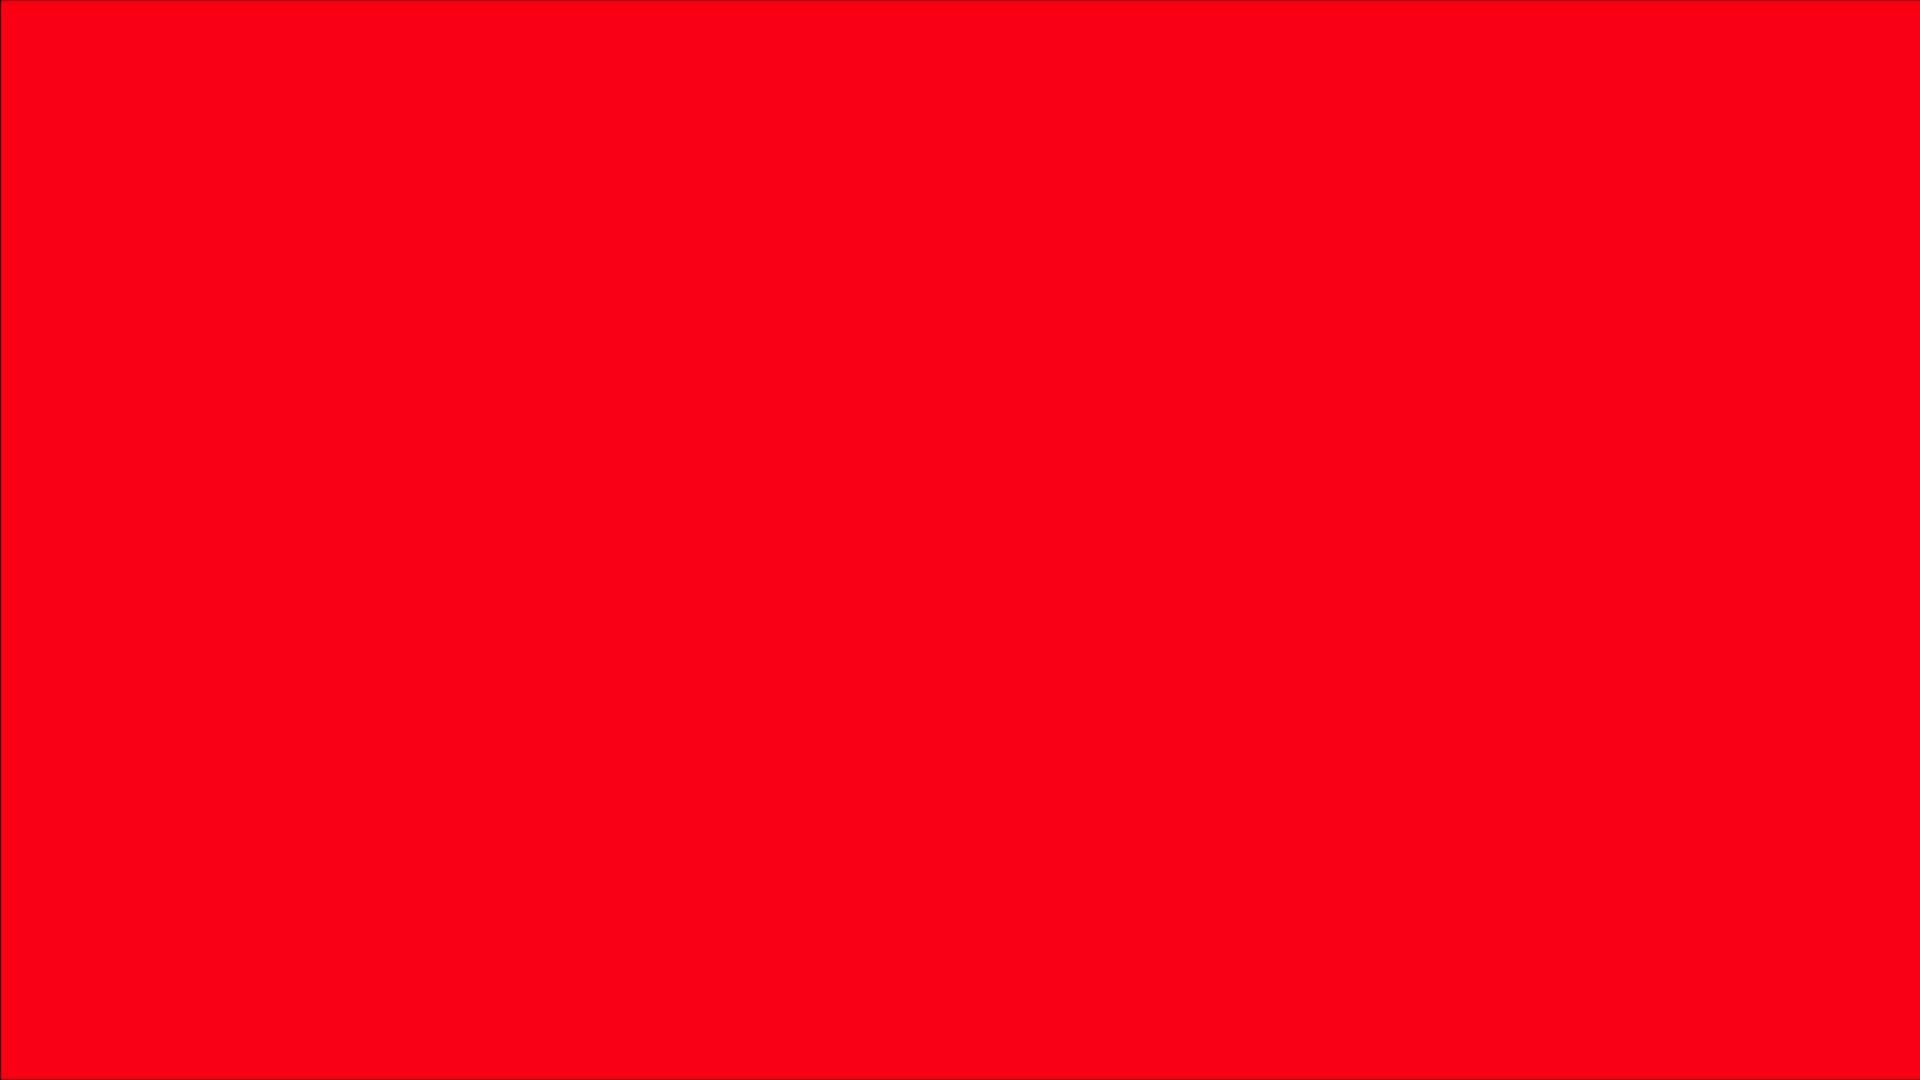 3d Background Wallpaper Apk Download Red Screen Wallpaper Gallery